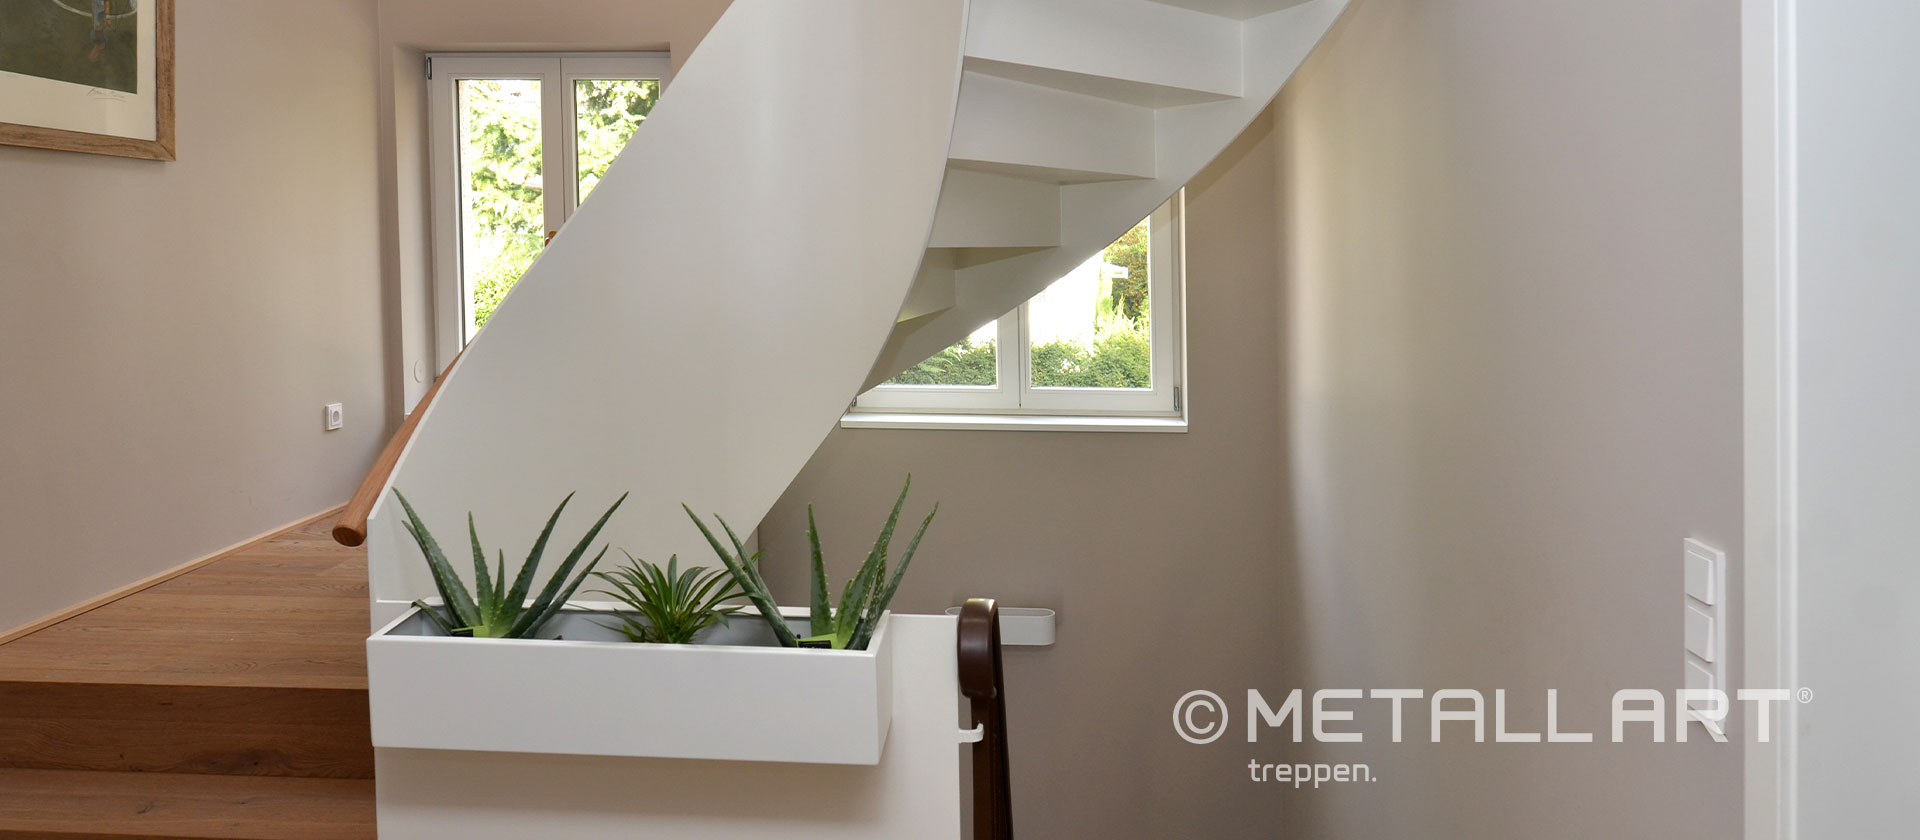 Offene gewendelte Treppe